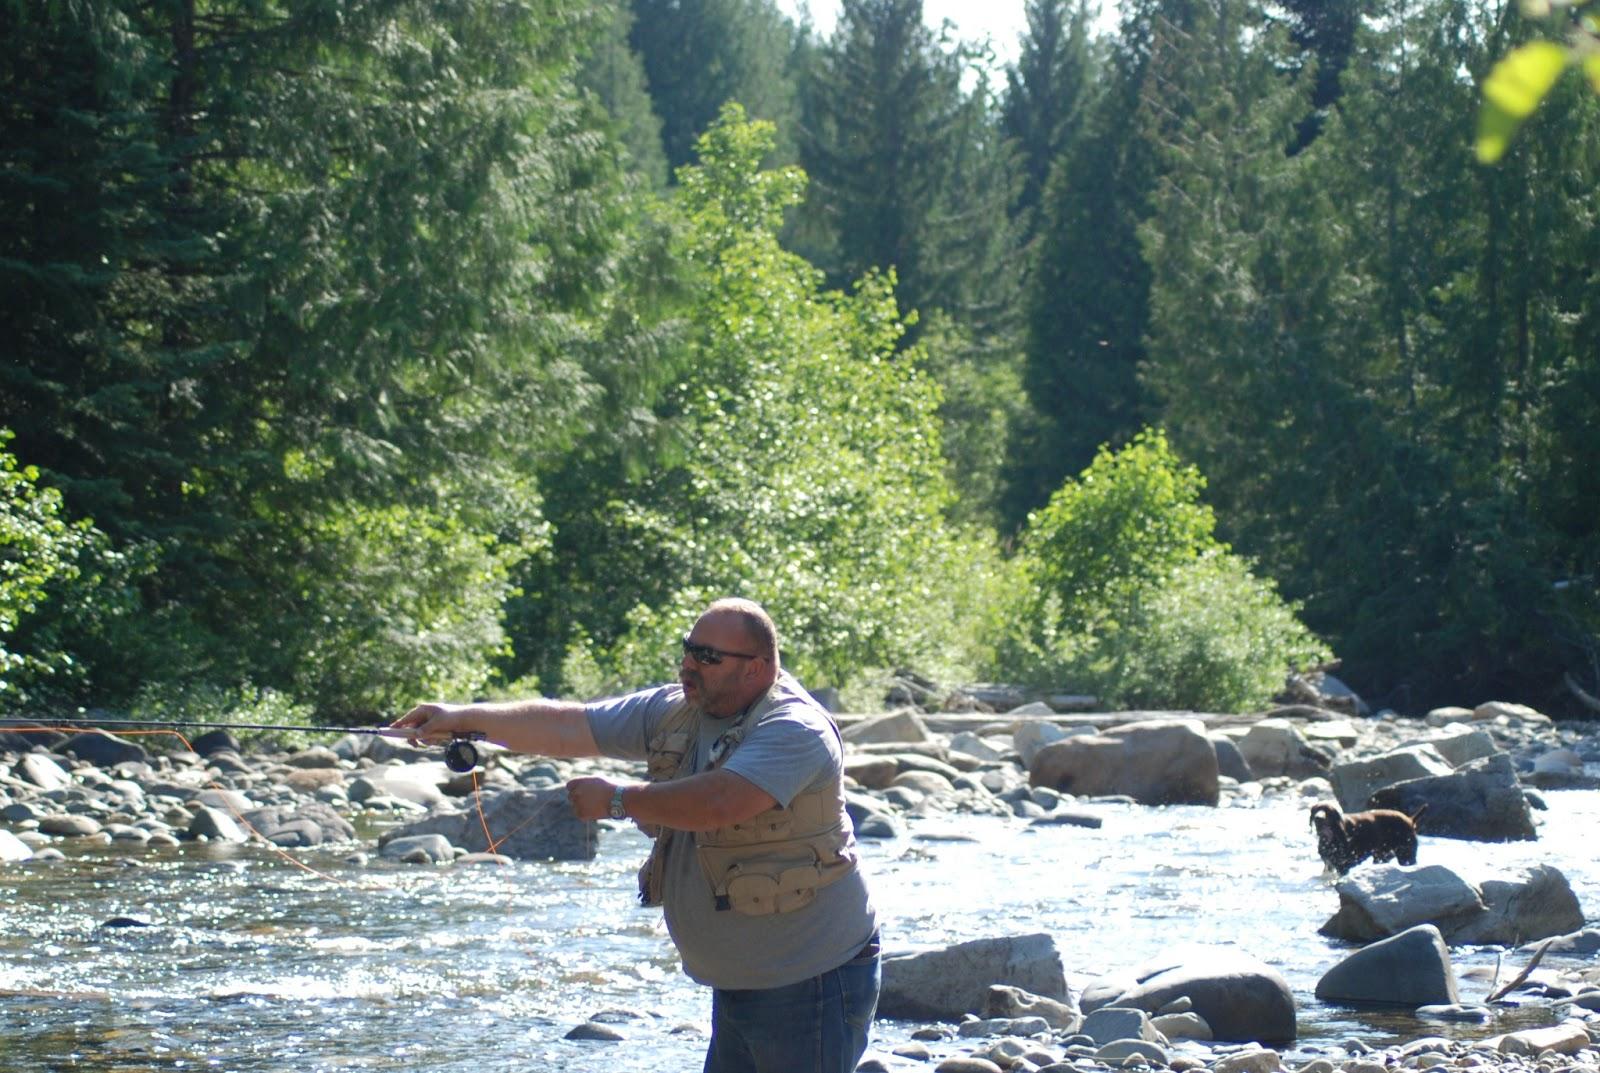 grouse creek Grouse creek (suba sa estados unidos, alaska, yukon-koyukuk census area, lat 65,72, long -148,02) grouse creek (suba sa estados unidos.